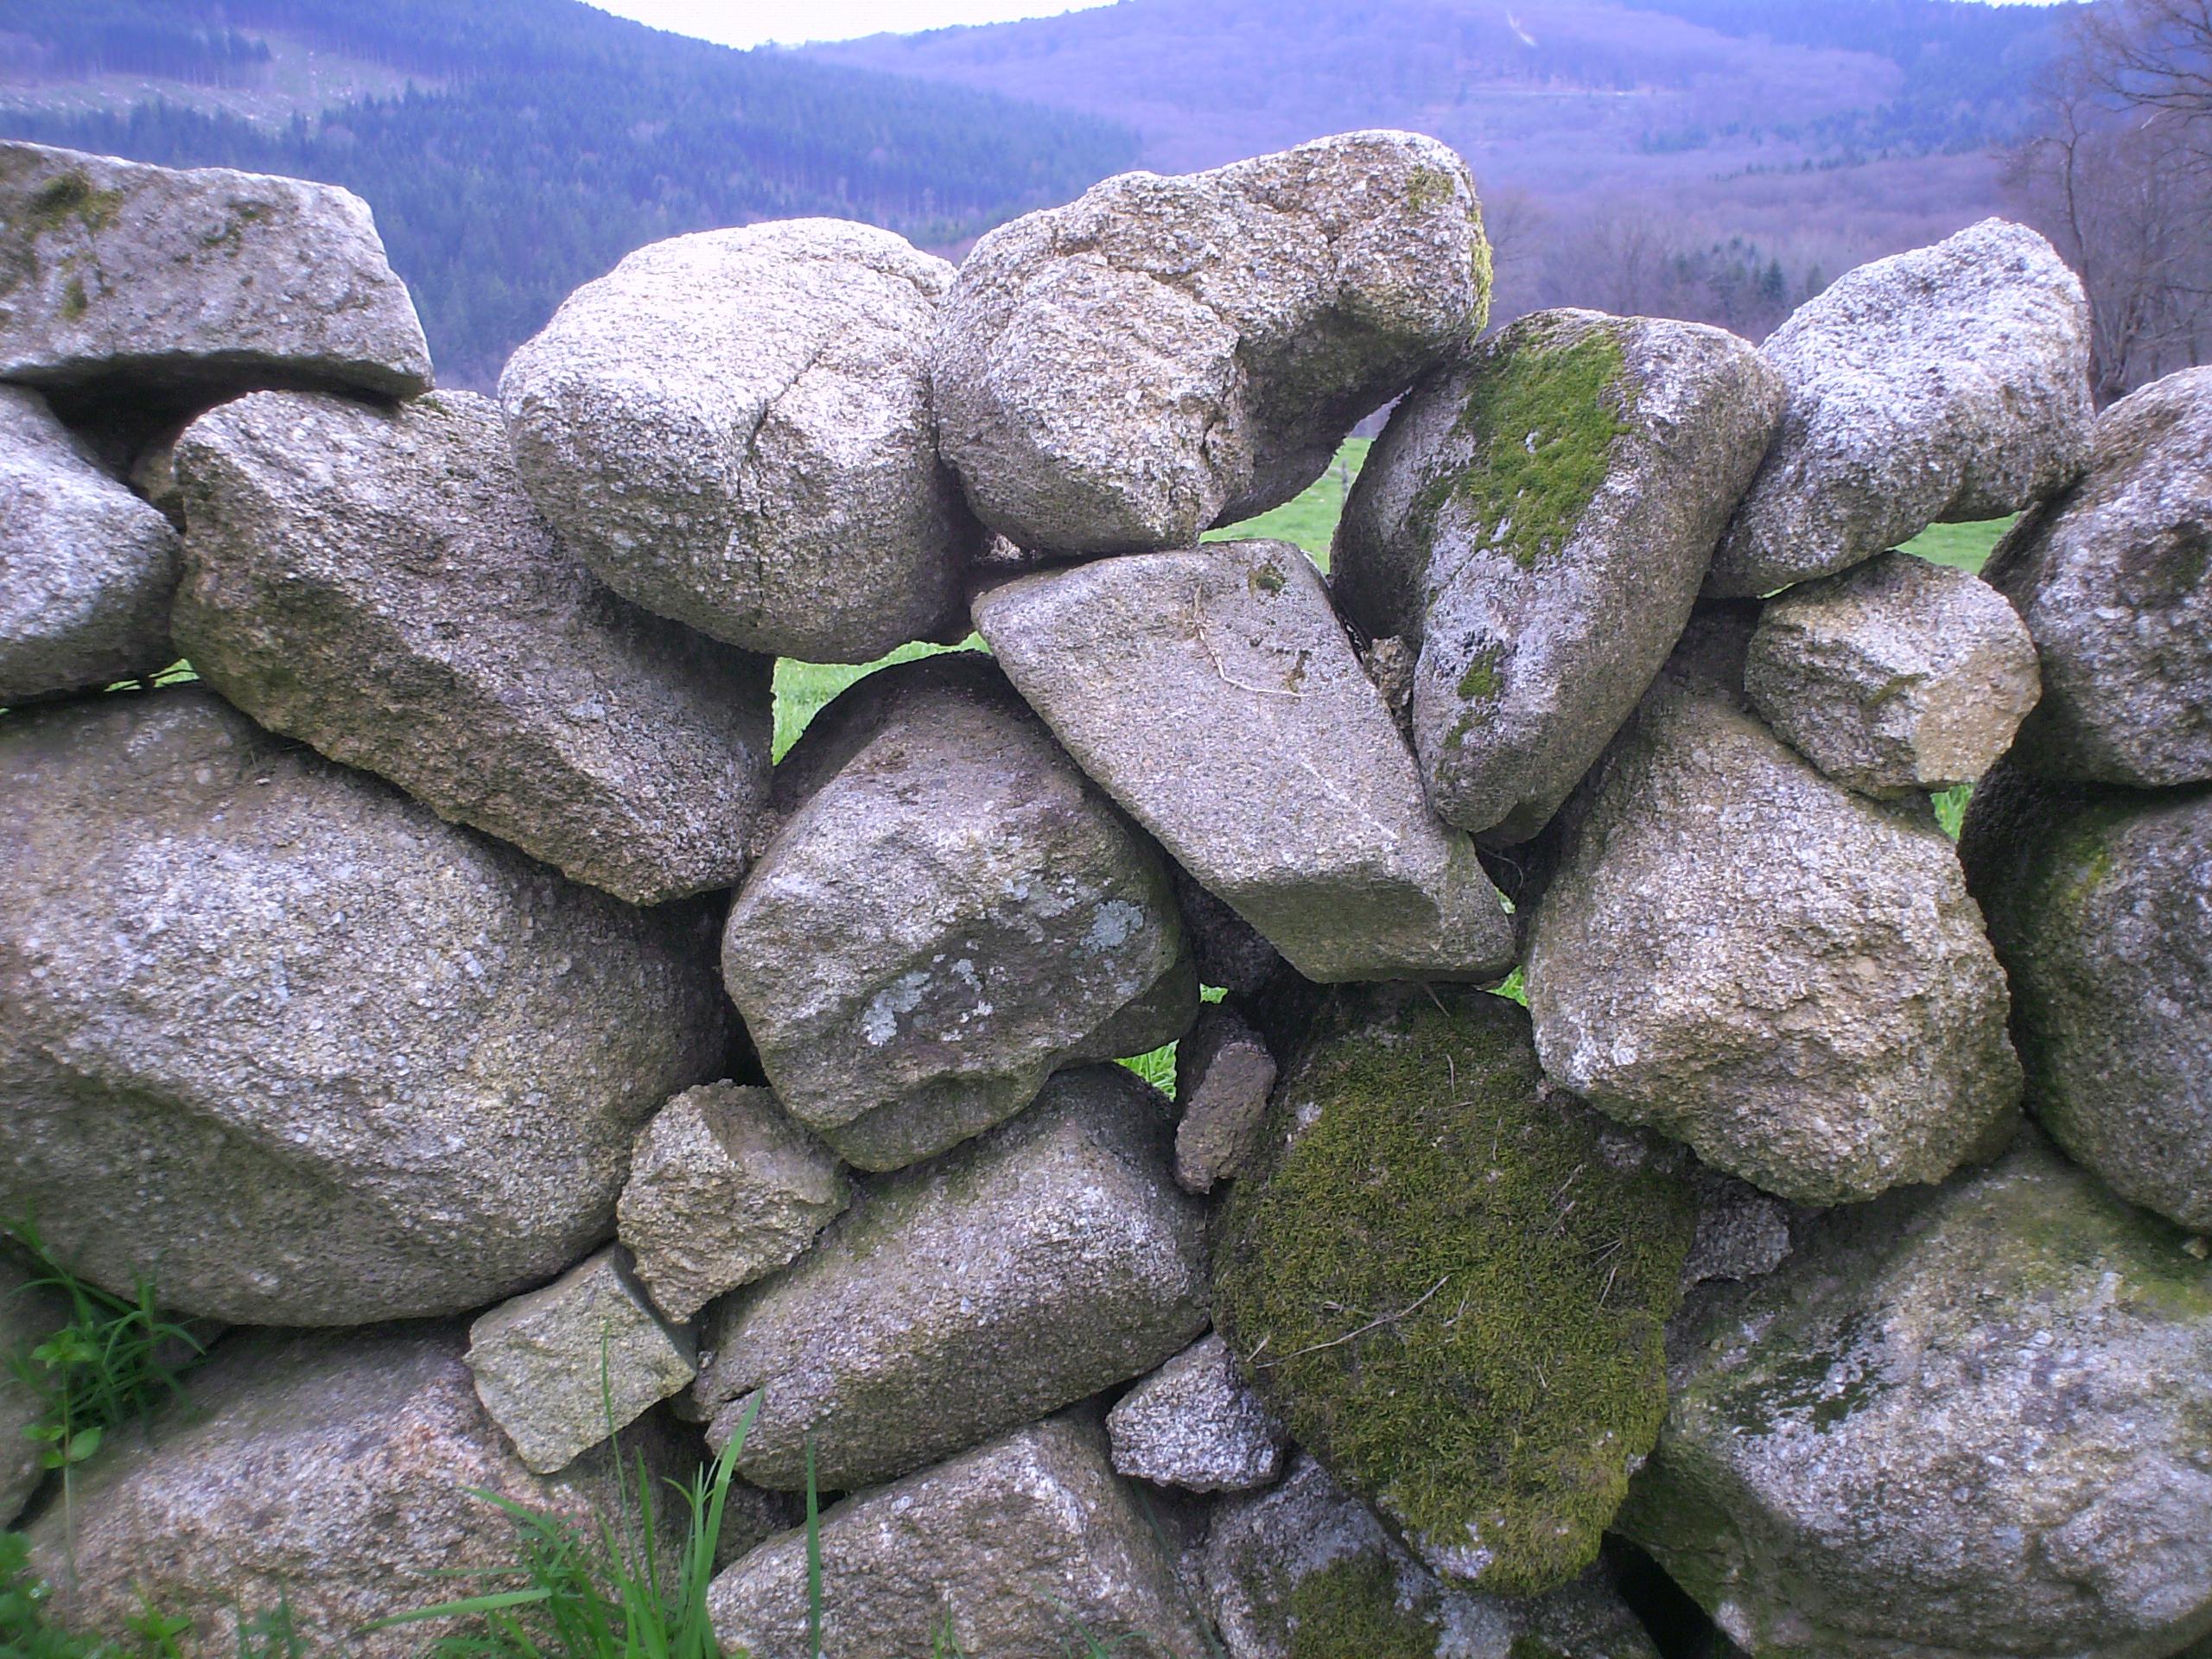 File mur de pierres s ches les bains sainte feyre 23 jpg wikimedia commons - Mur pierres apparentes ...